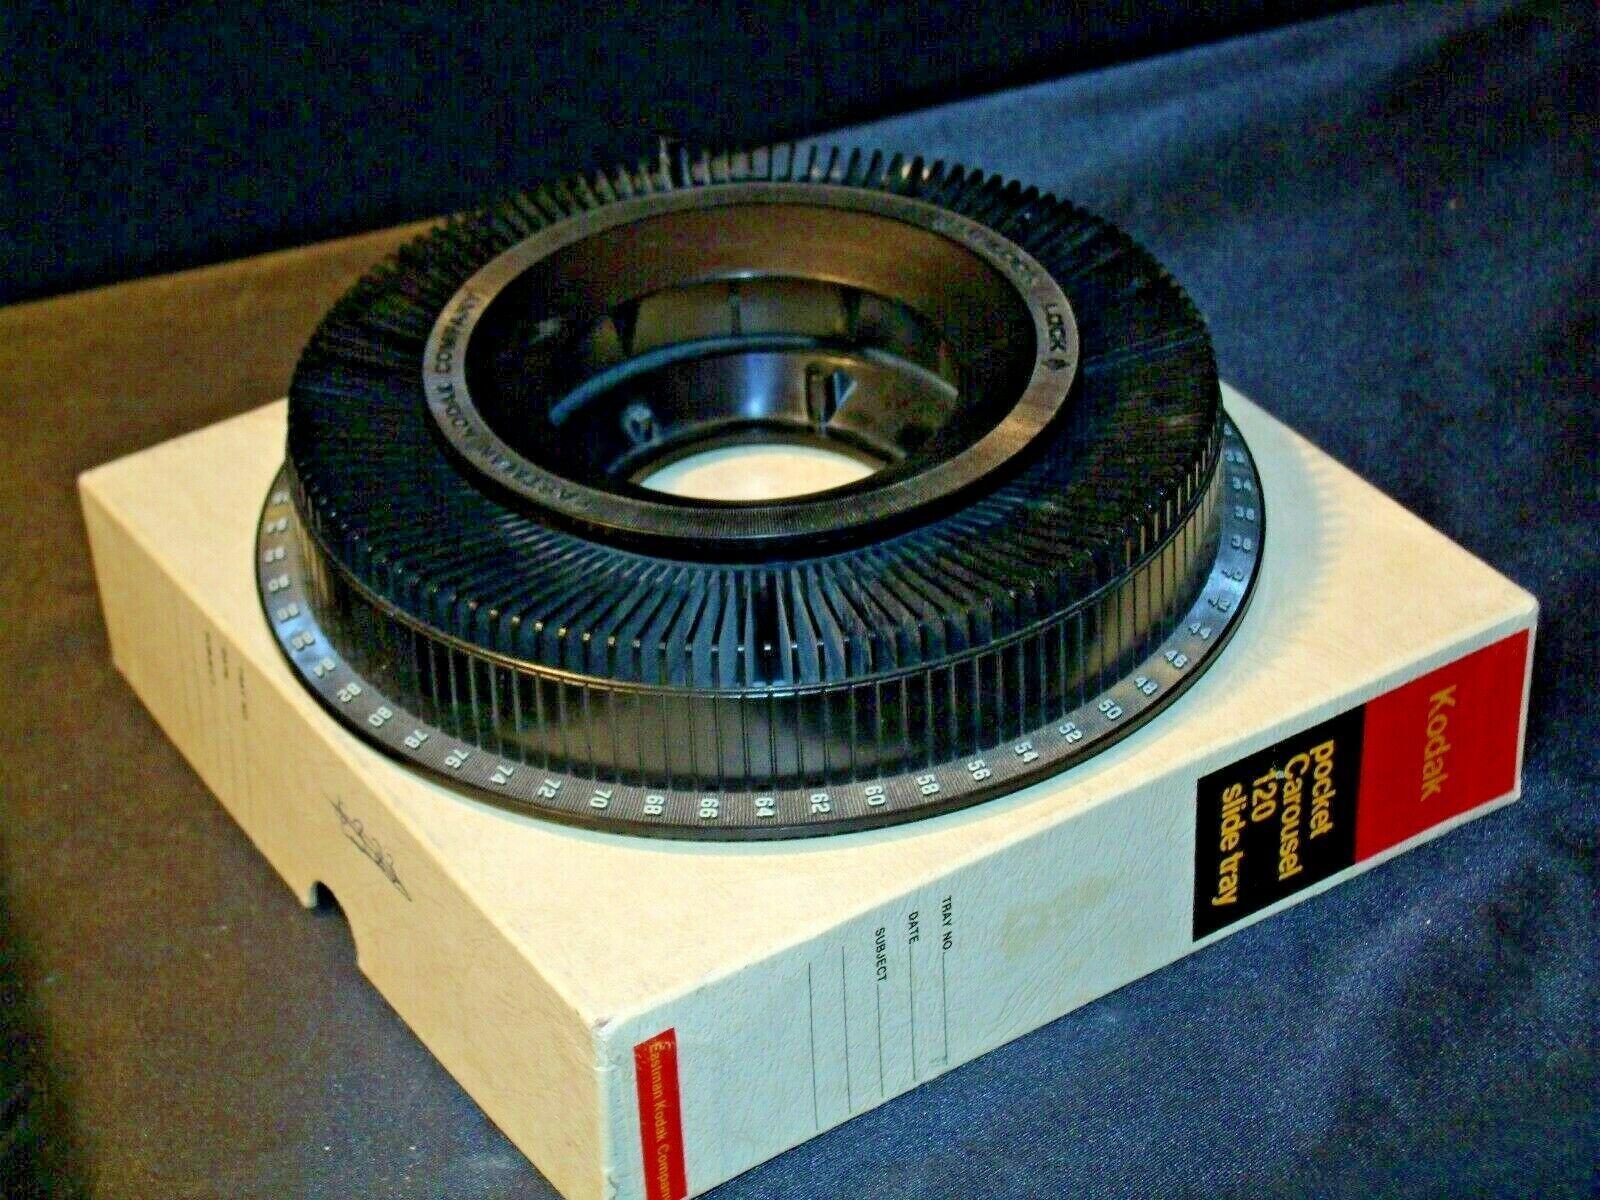 Kodak Pocket Carousel 120 Slide Tray AA-192041 Vintage